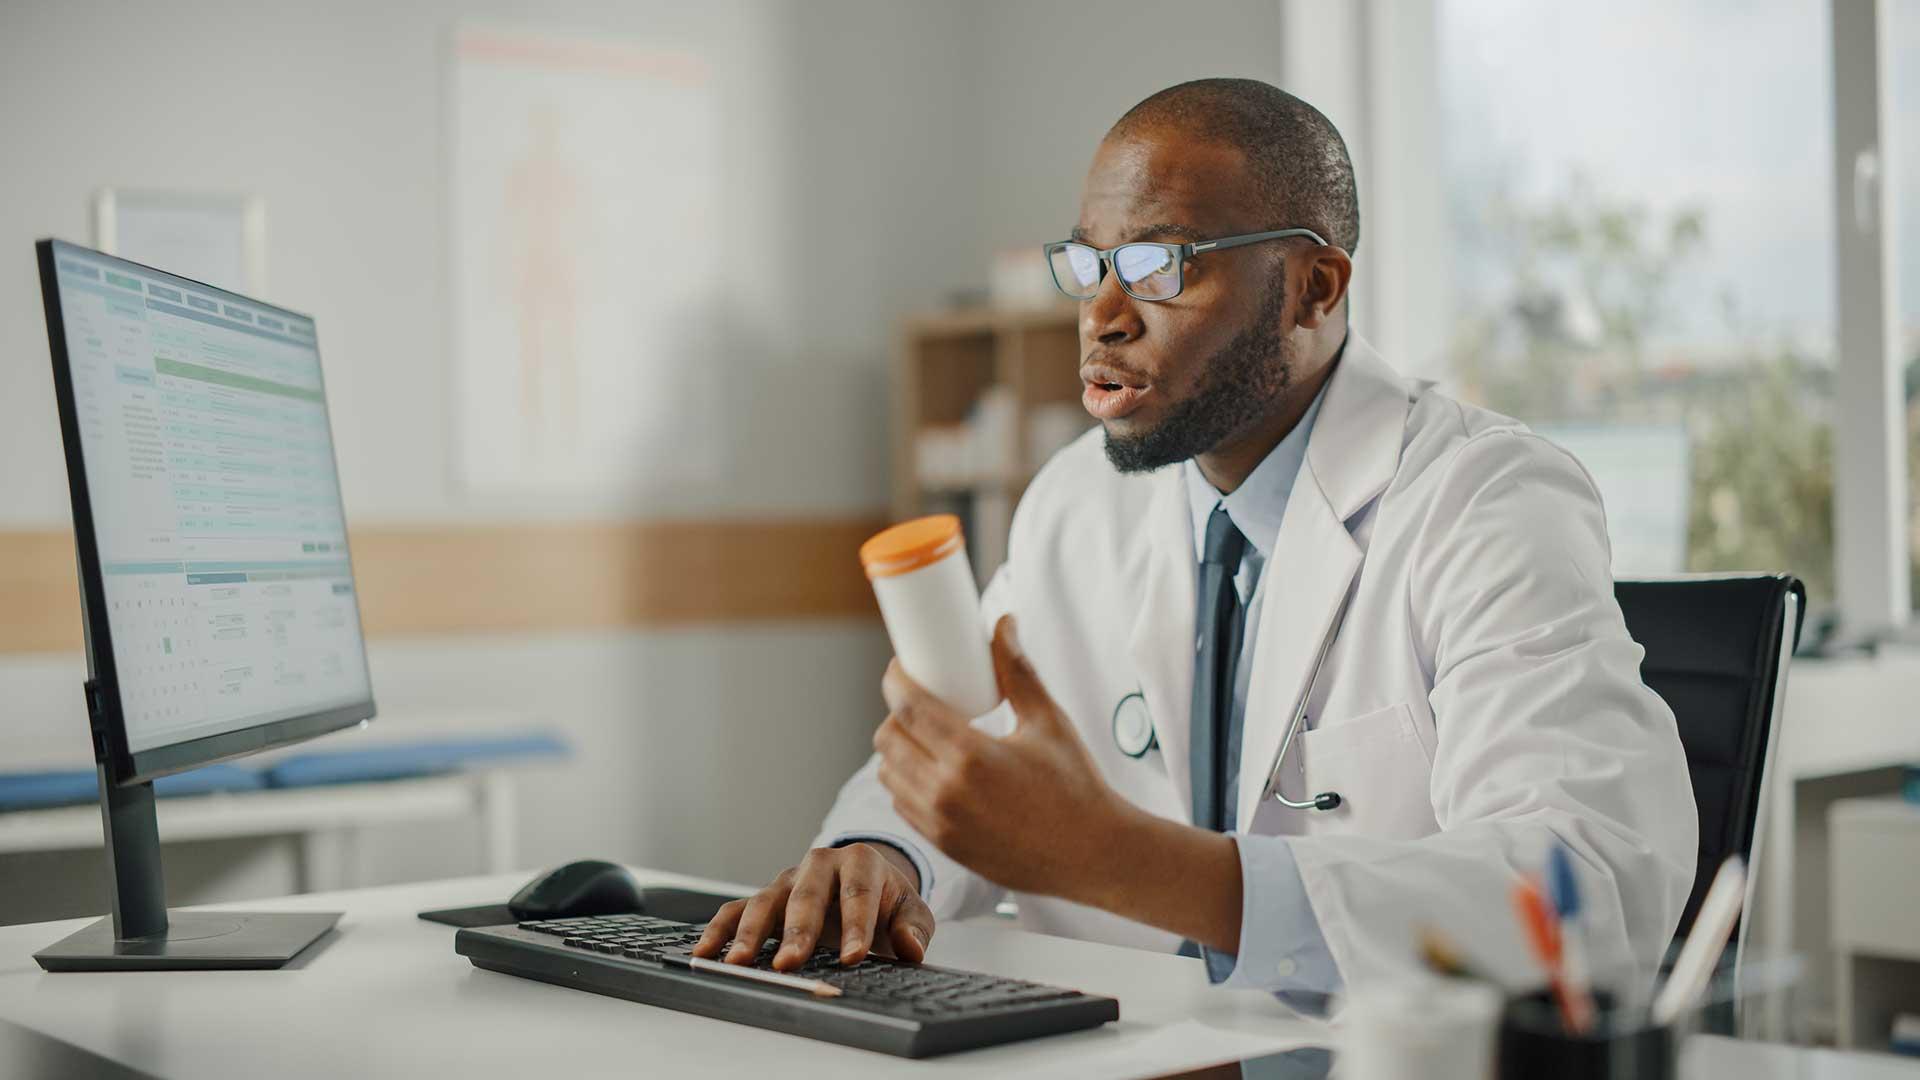 Doctor looking at EHR prescribing new drug to patient